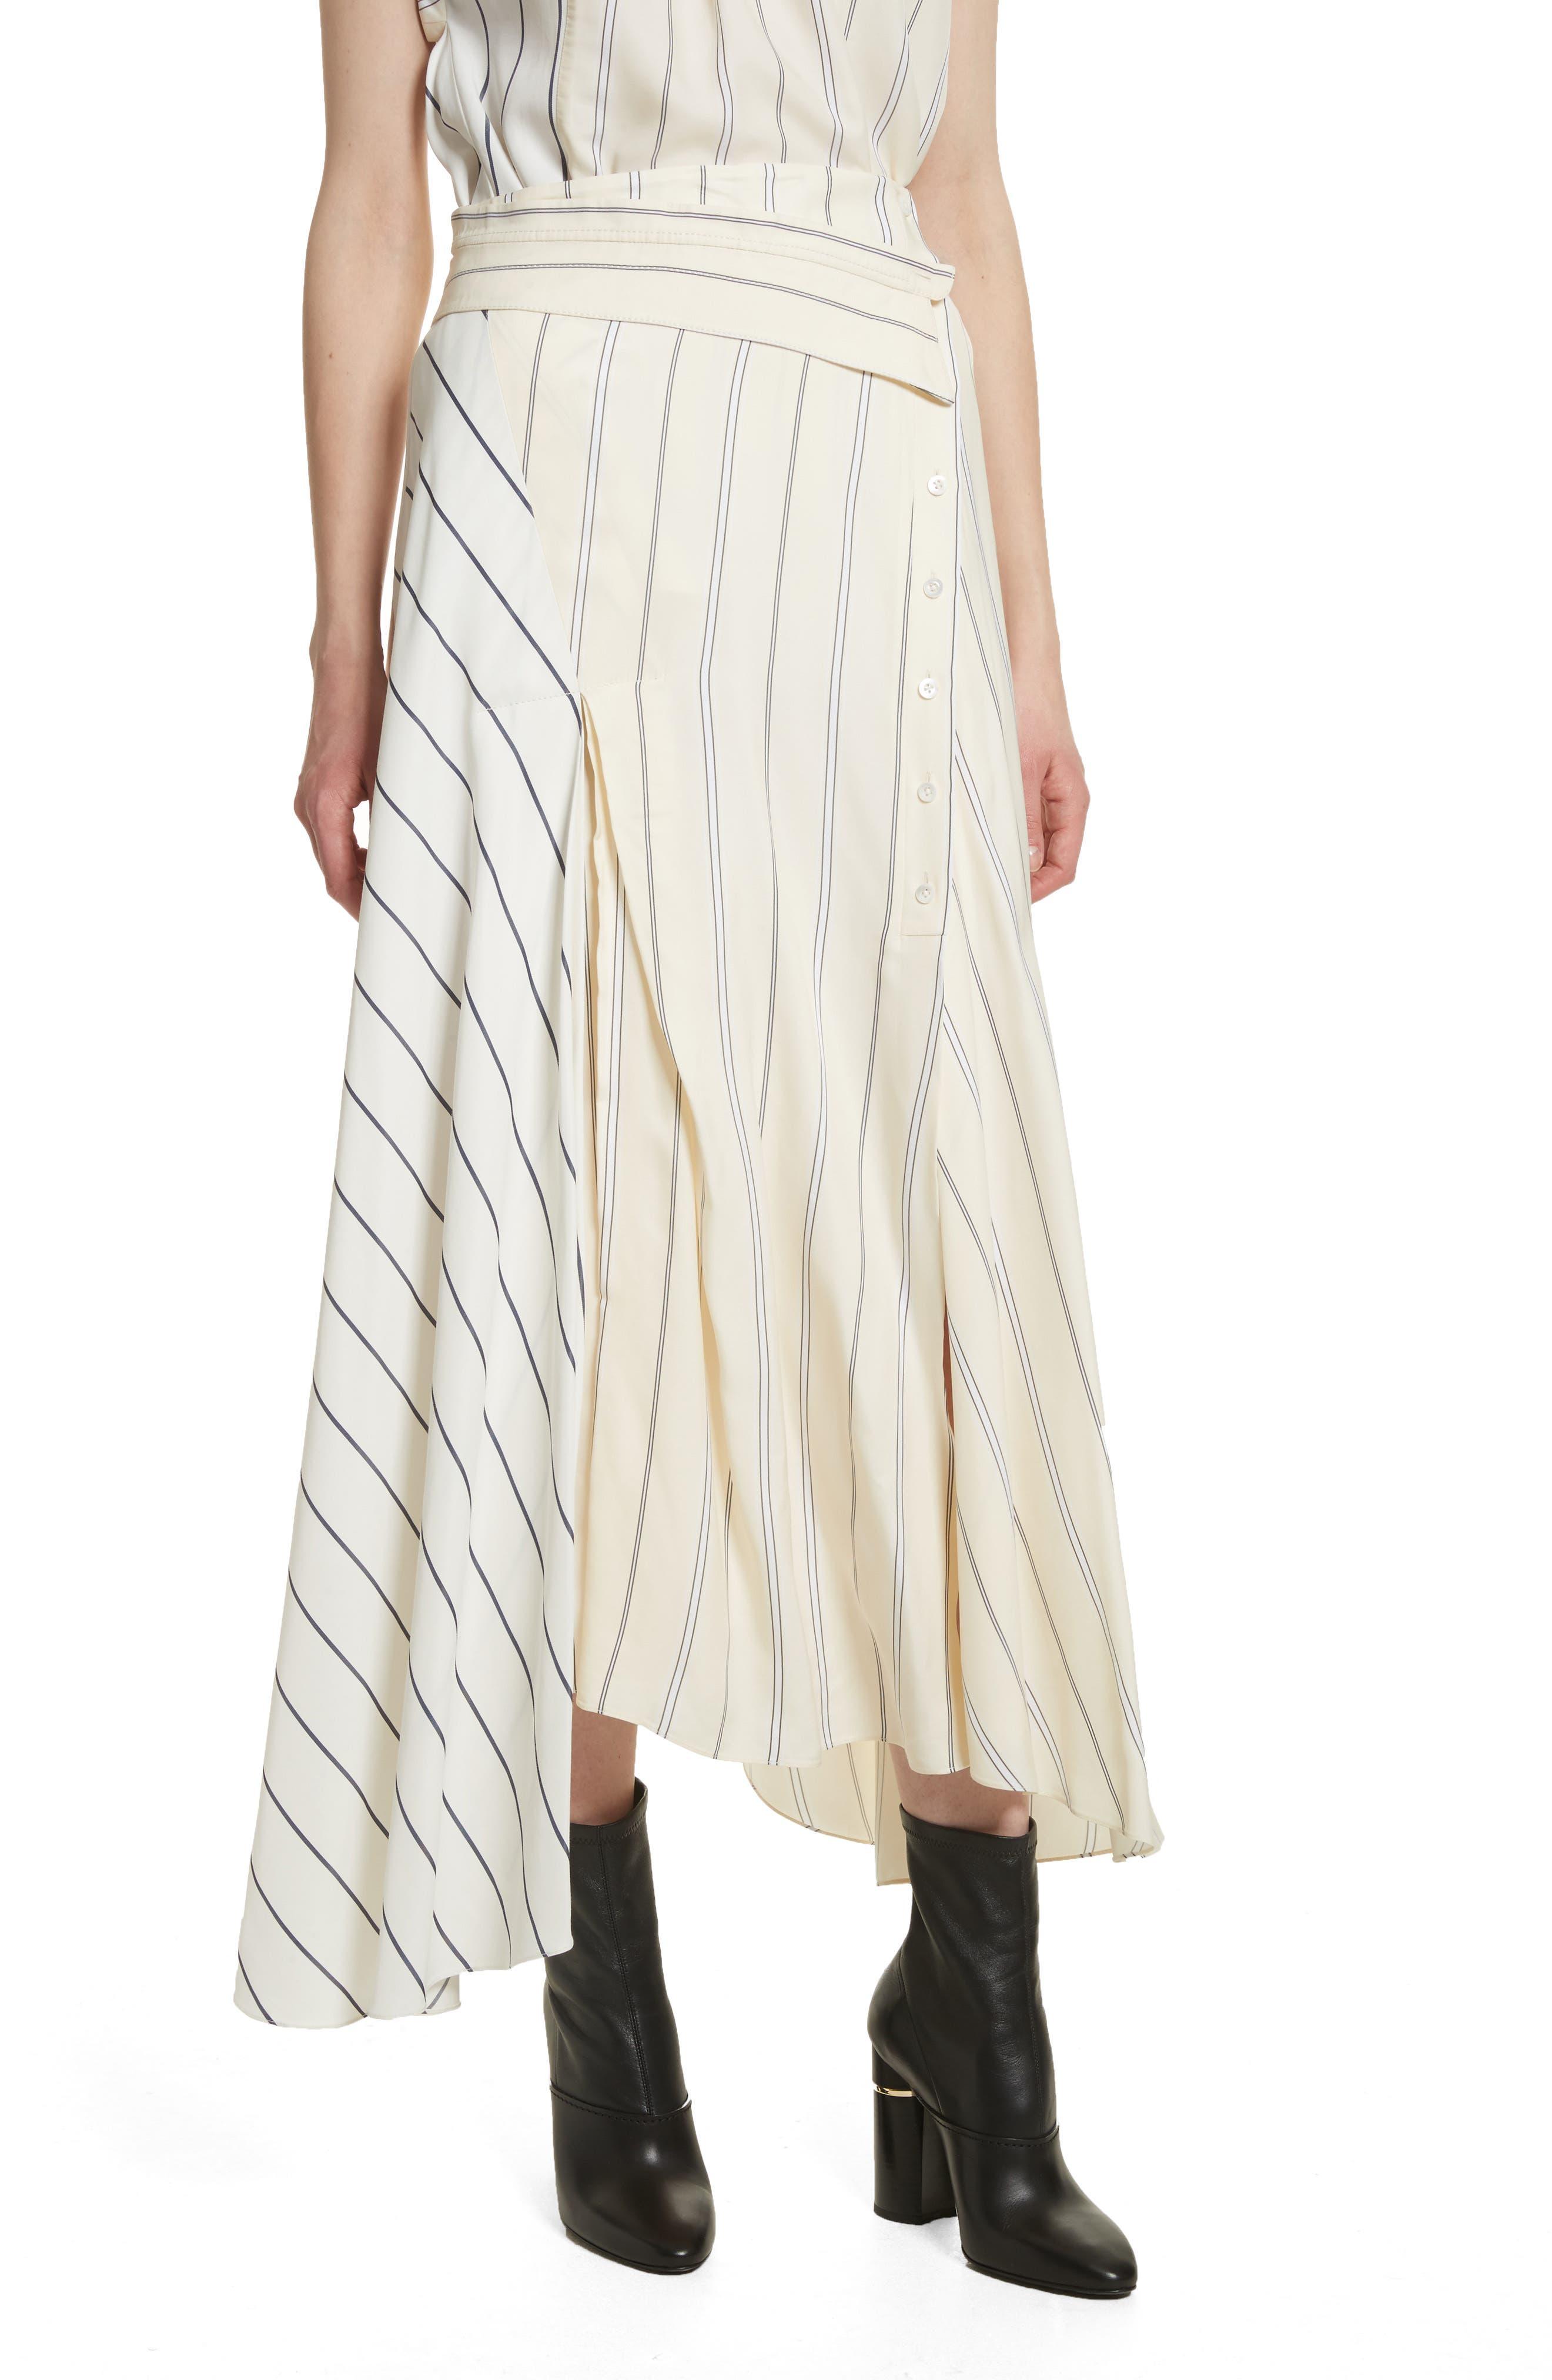 Mixed Stripe Asymmetrical Skirt,                             Main thumbnail 1, color,                             Ivory/ Black